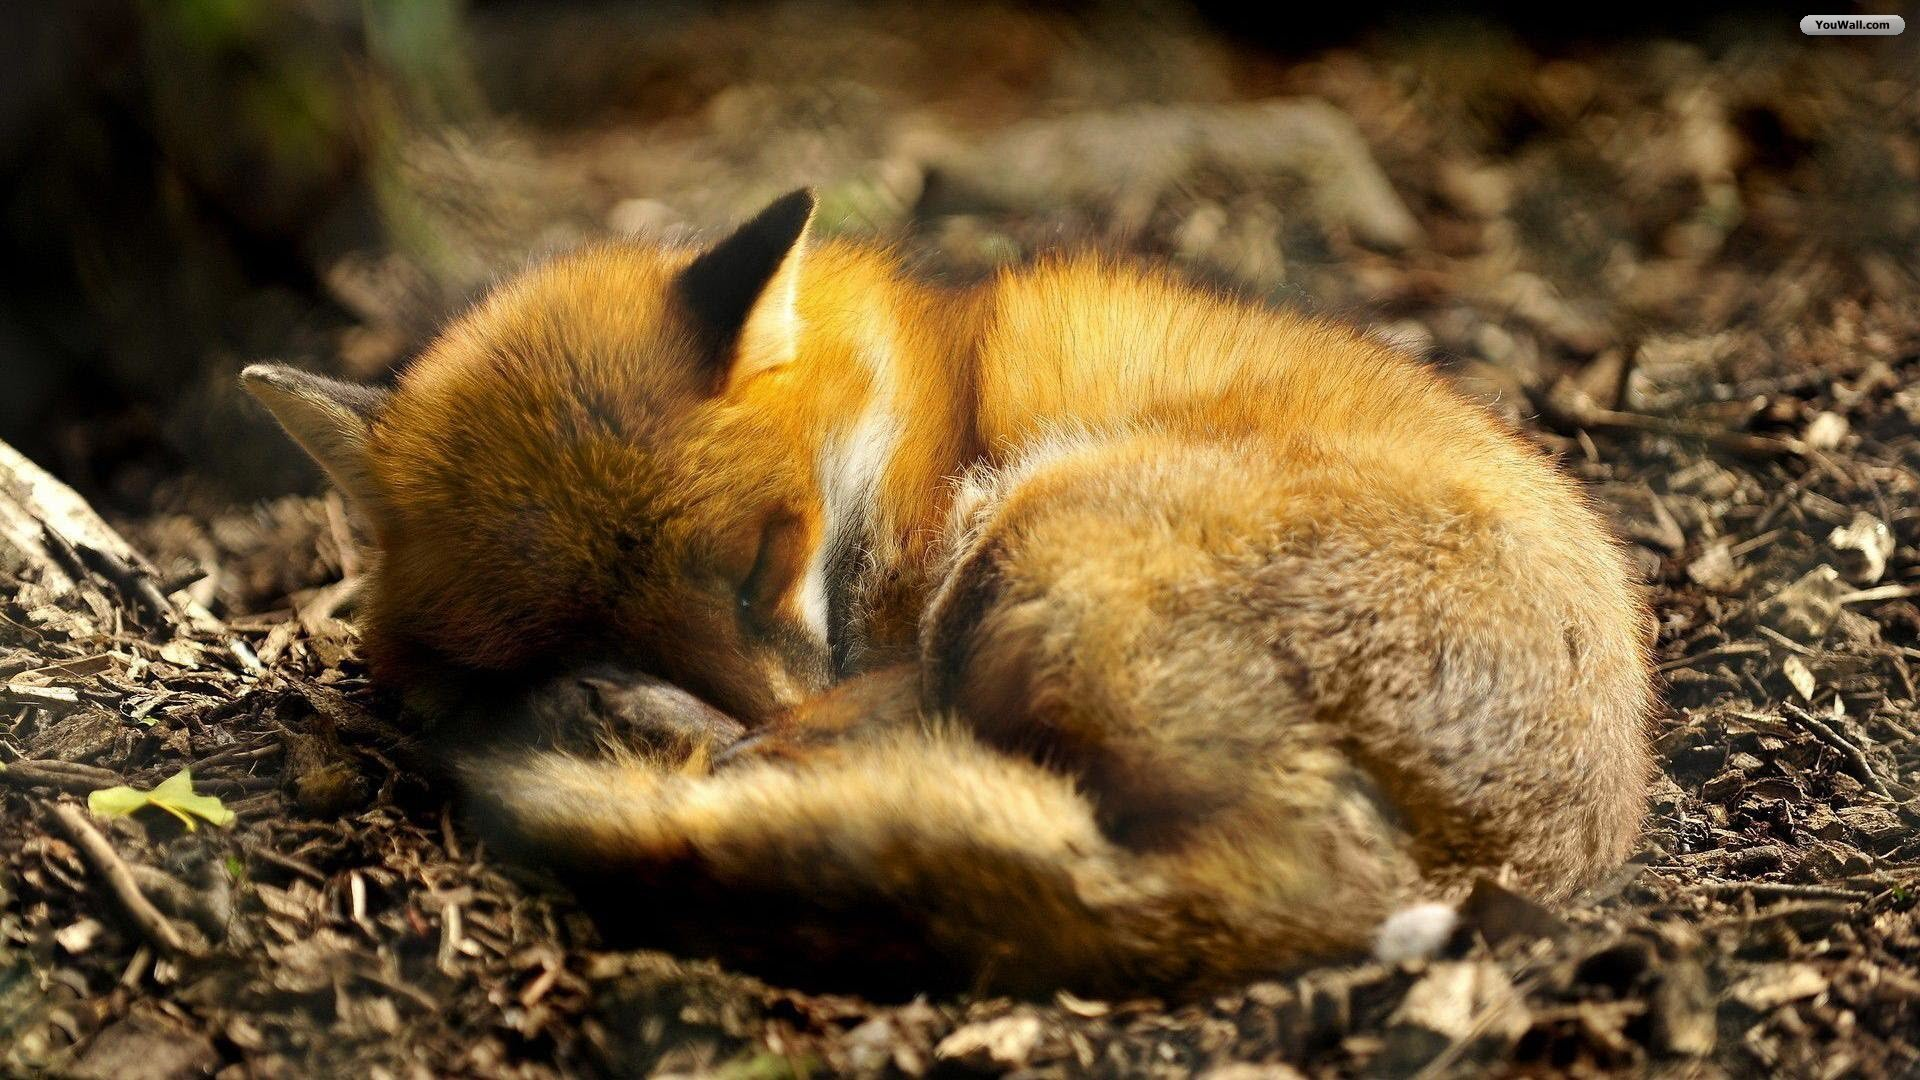 Fox Cuteconnoisseur